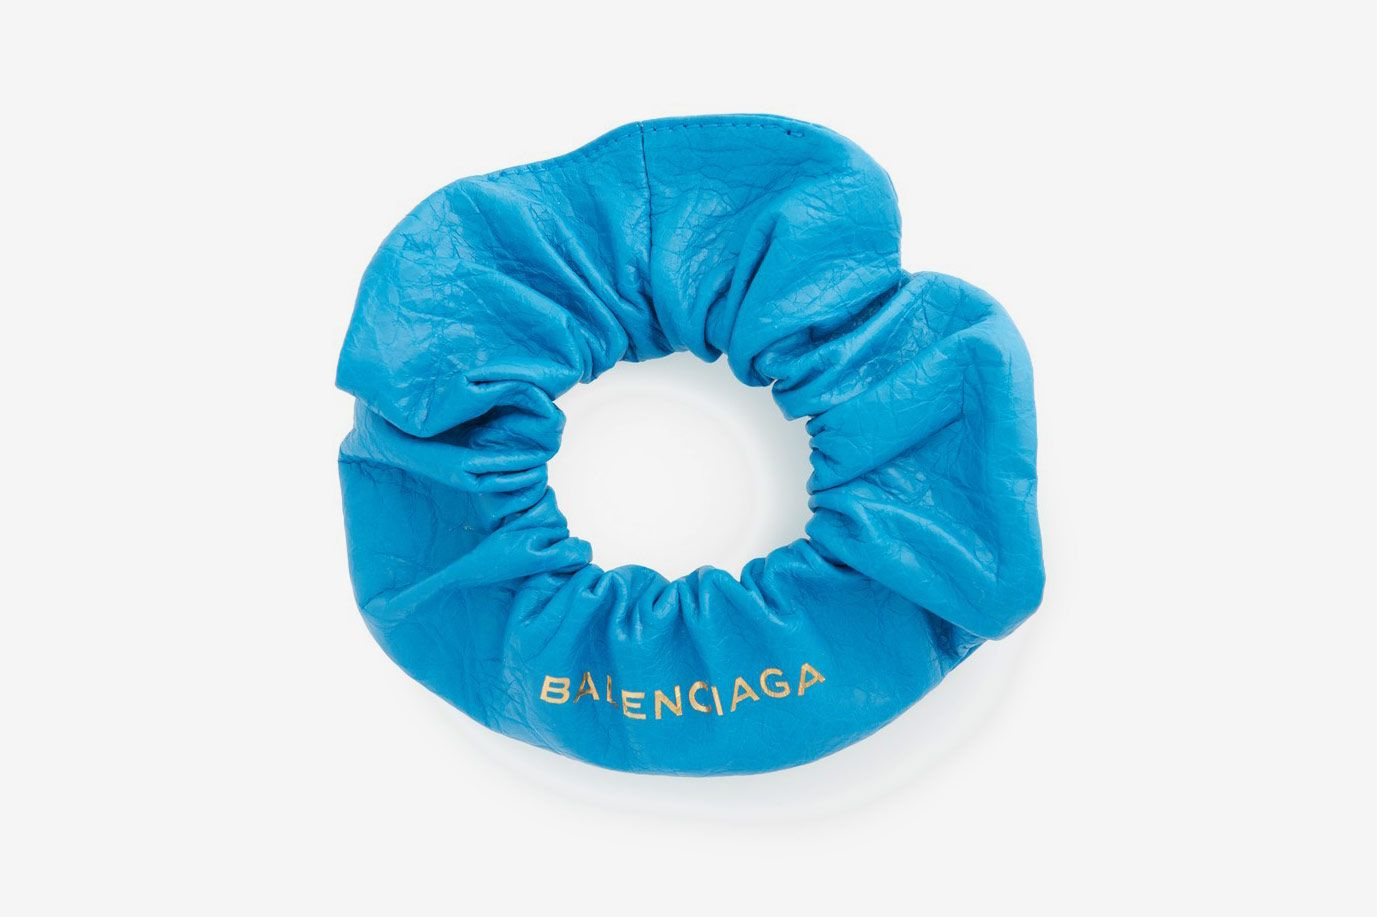 Balenciaga Chouchou Leather Bracelet